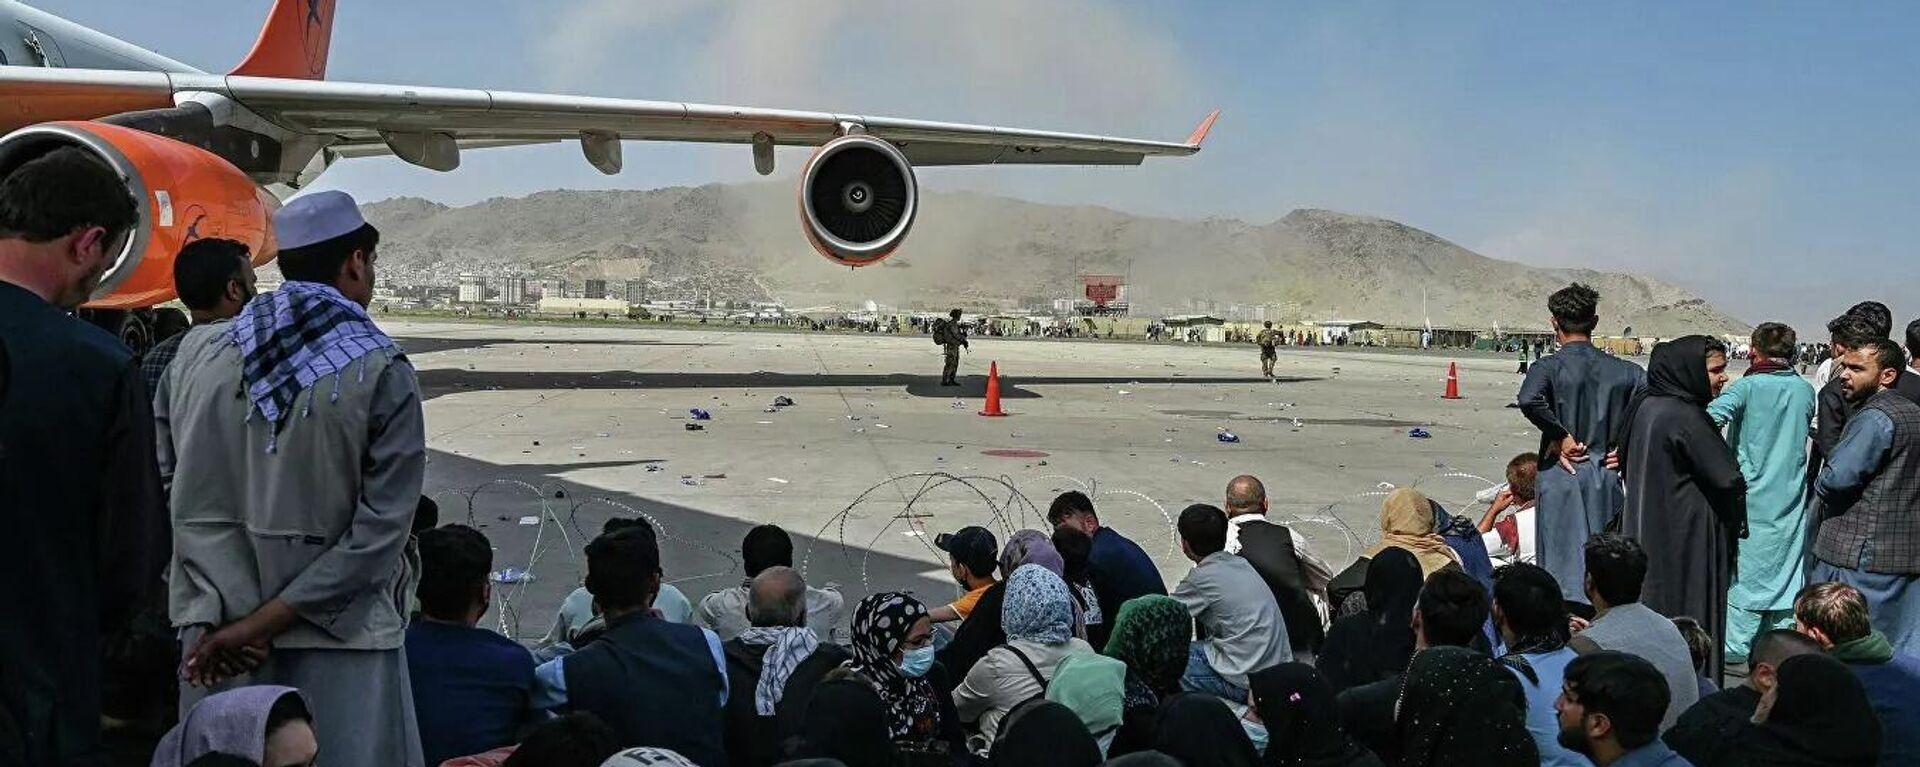 Пассажиры в аэропорту Кабула  - Sputnik Тоҷикистон, 1920, 19.08.2021